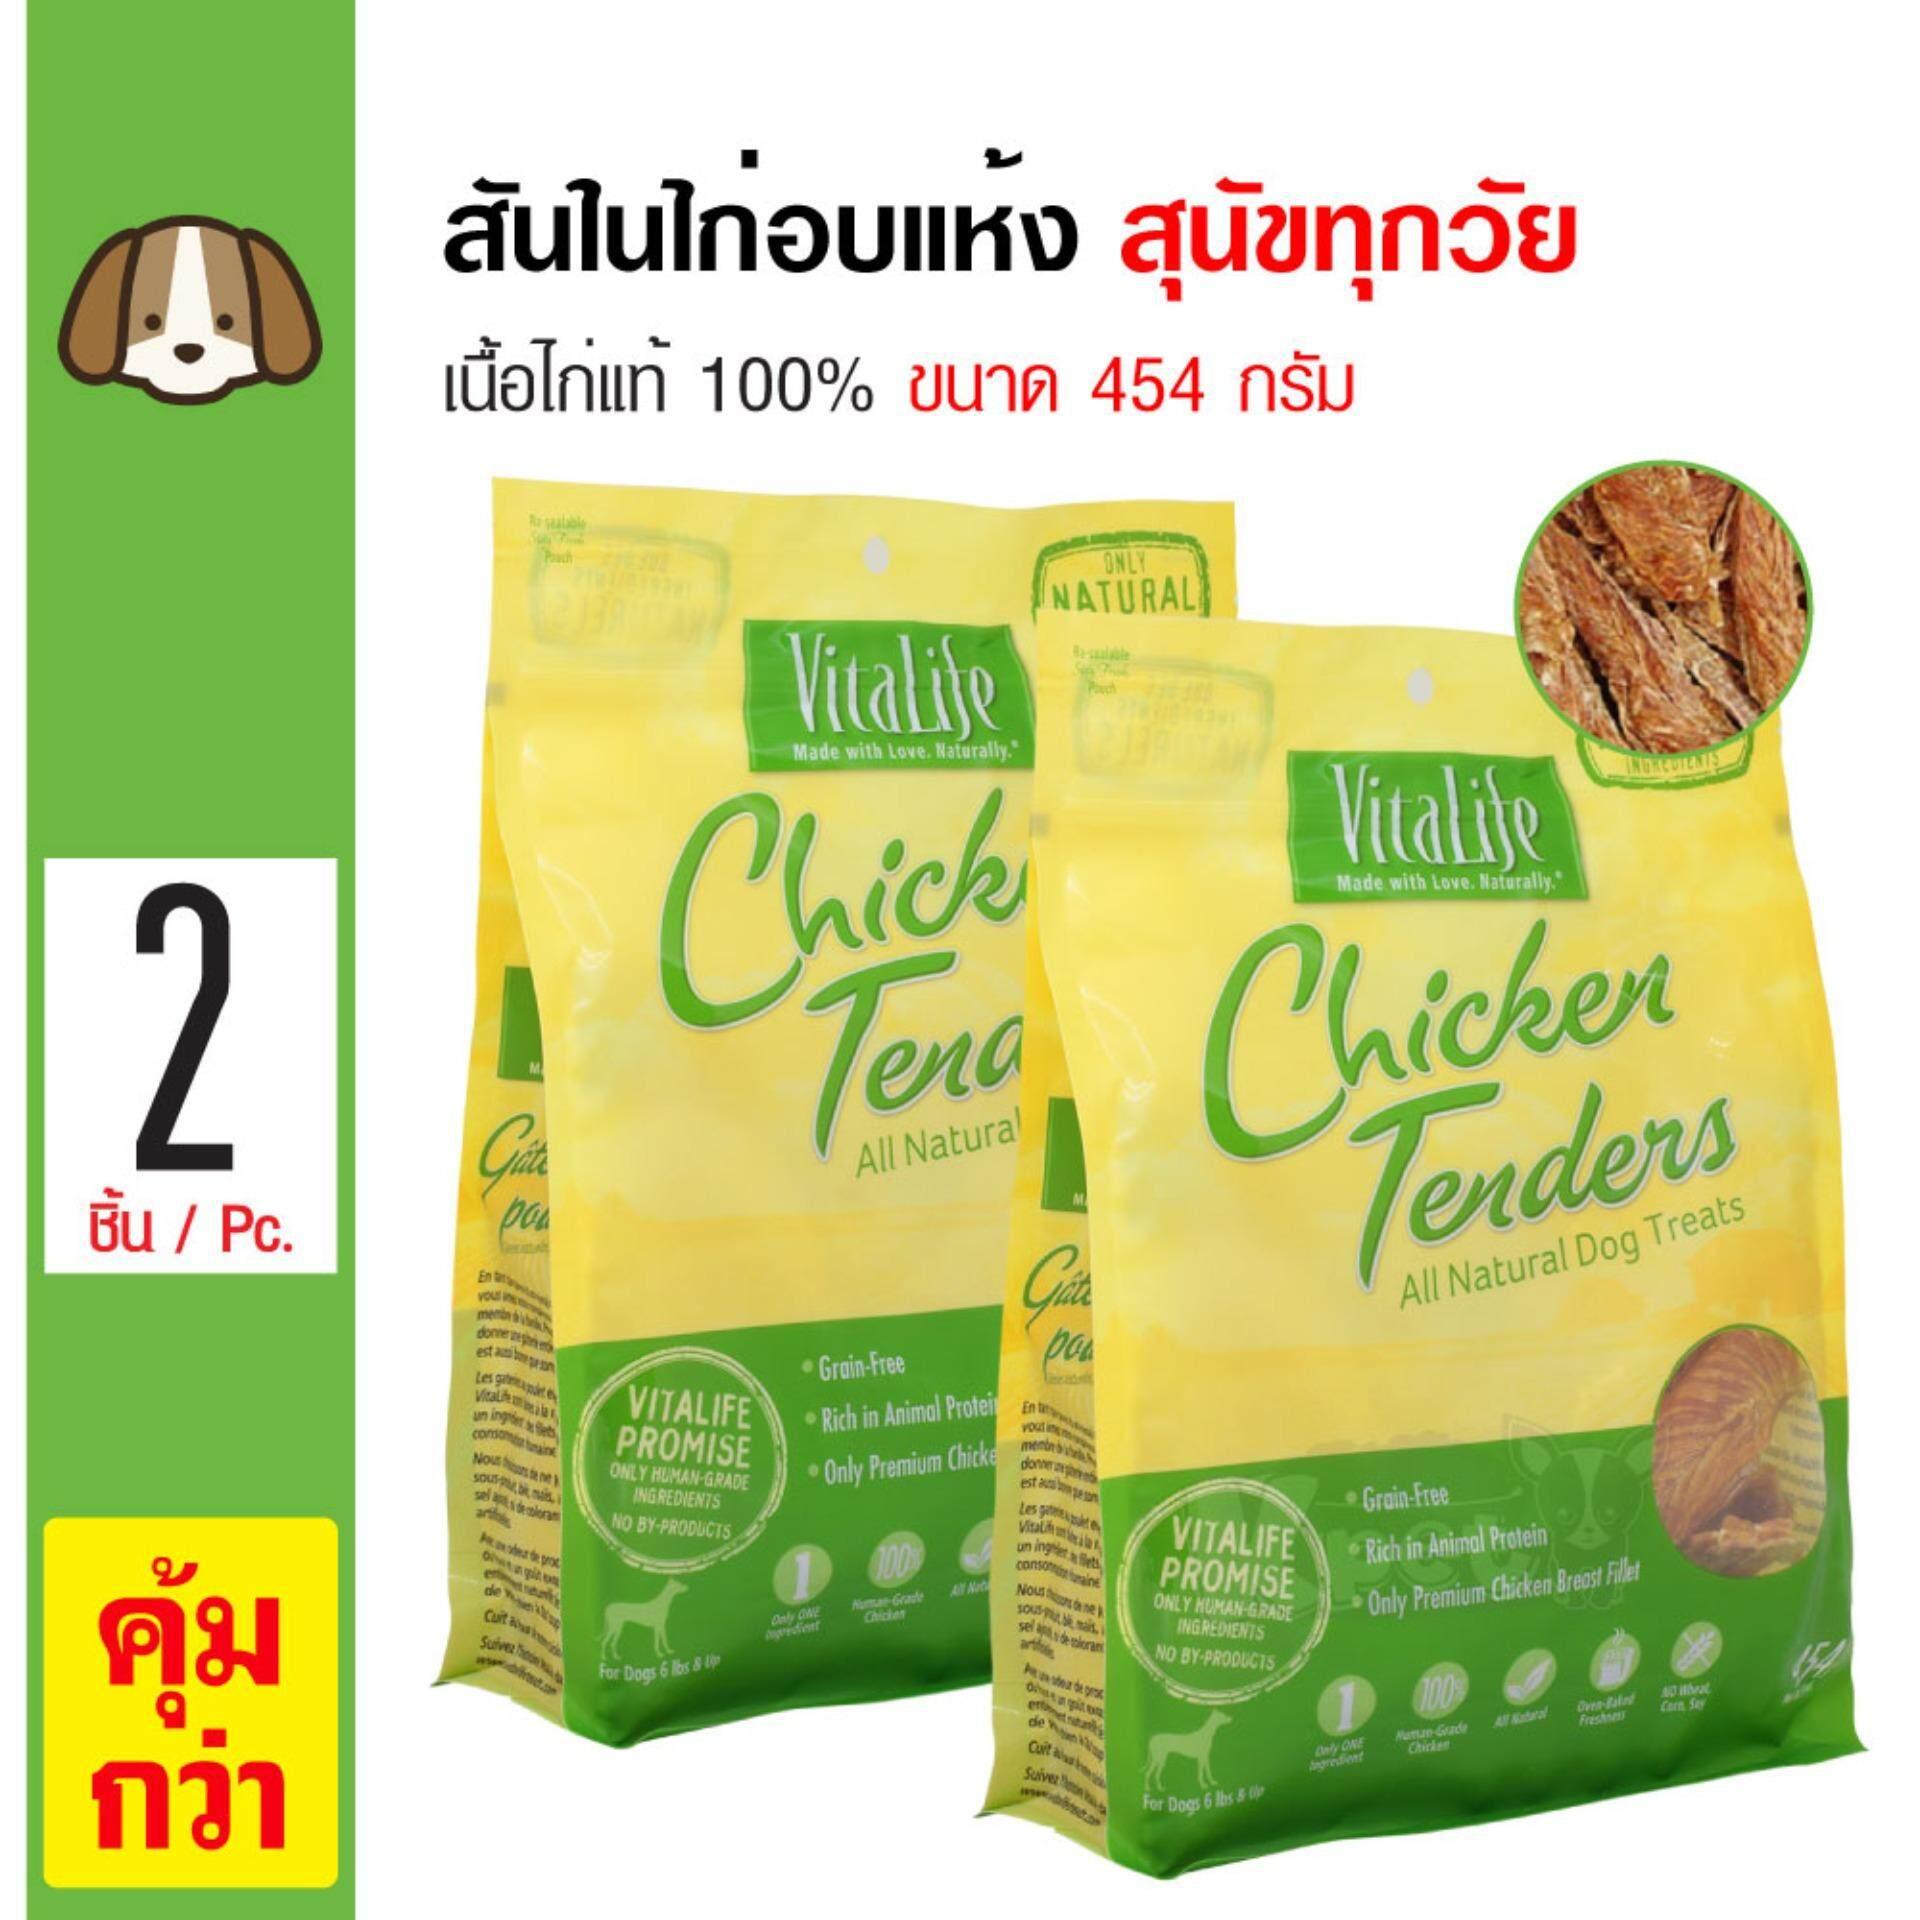 Vitalife Chicken Tenders ขนมสุนัข สันในไก่อบแห้งแท้ 100% สำหรับสุนัขทุกสายพันธุ์ (454 กรัม/ถุง) X 2 ถุง.